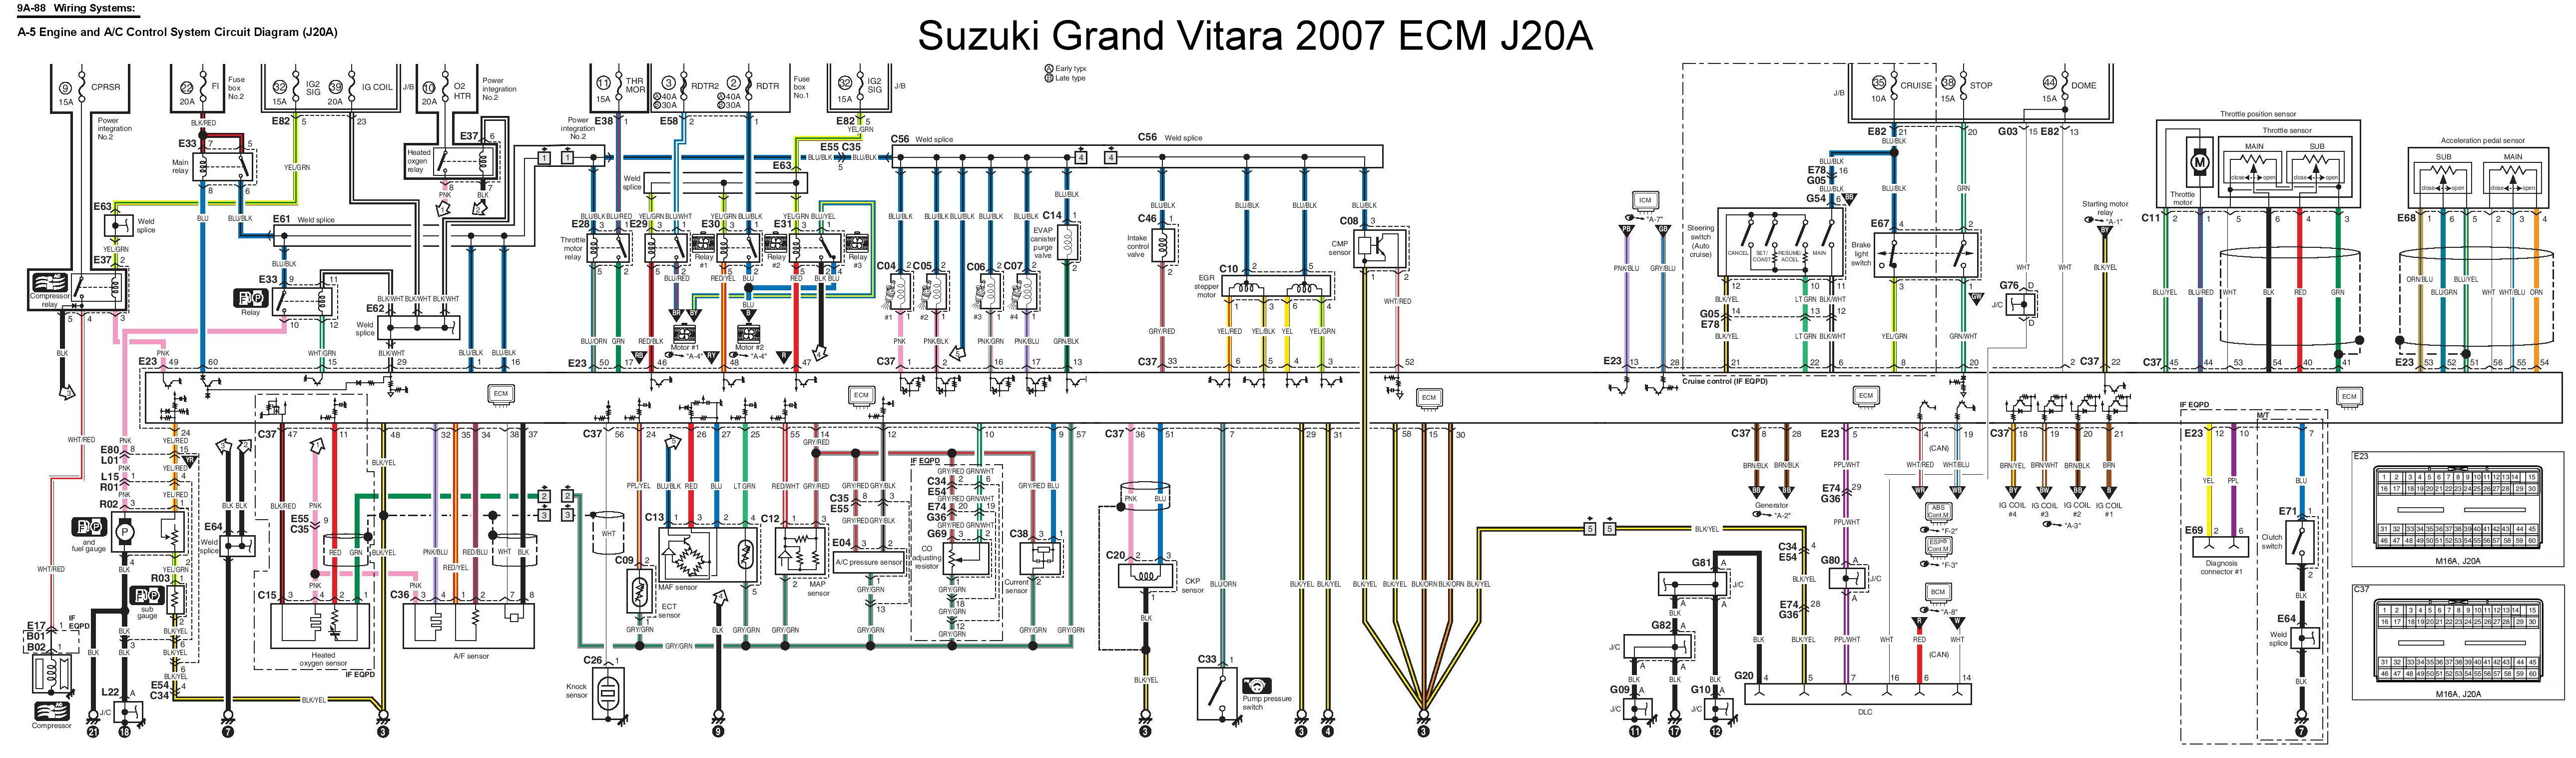 Suzuki Sx4 O2 Sensor Wiring Diagram